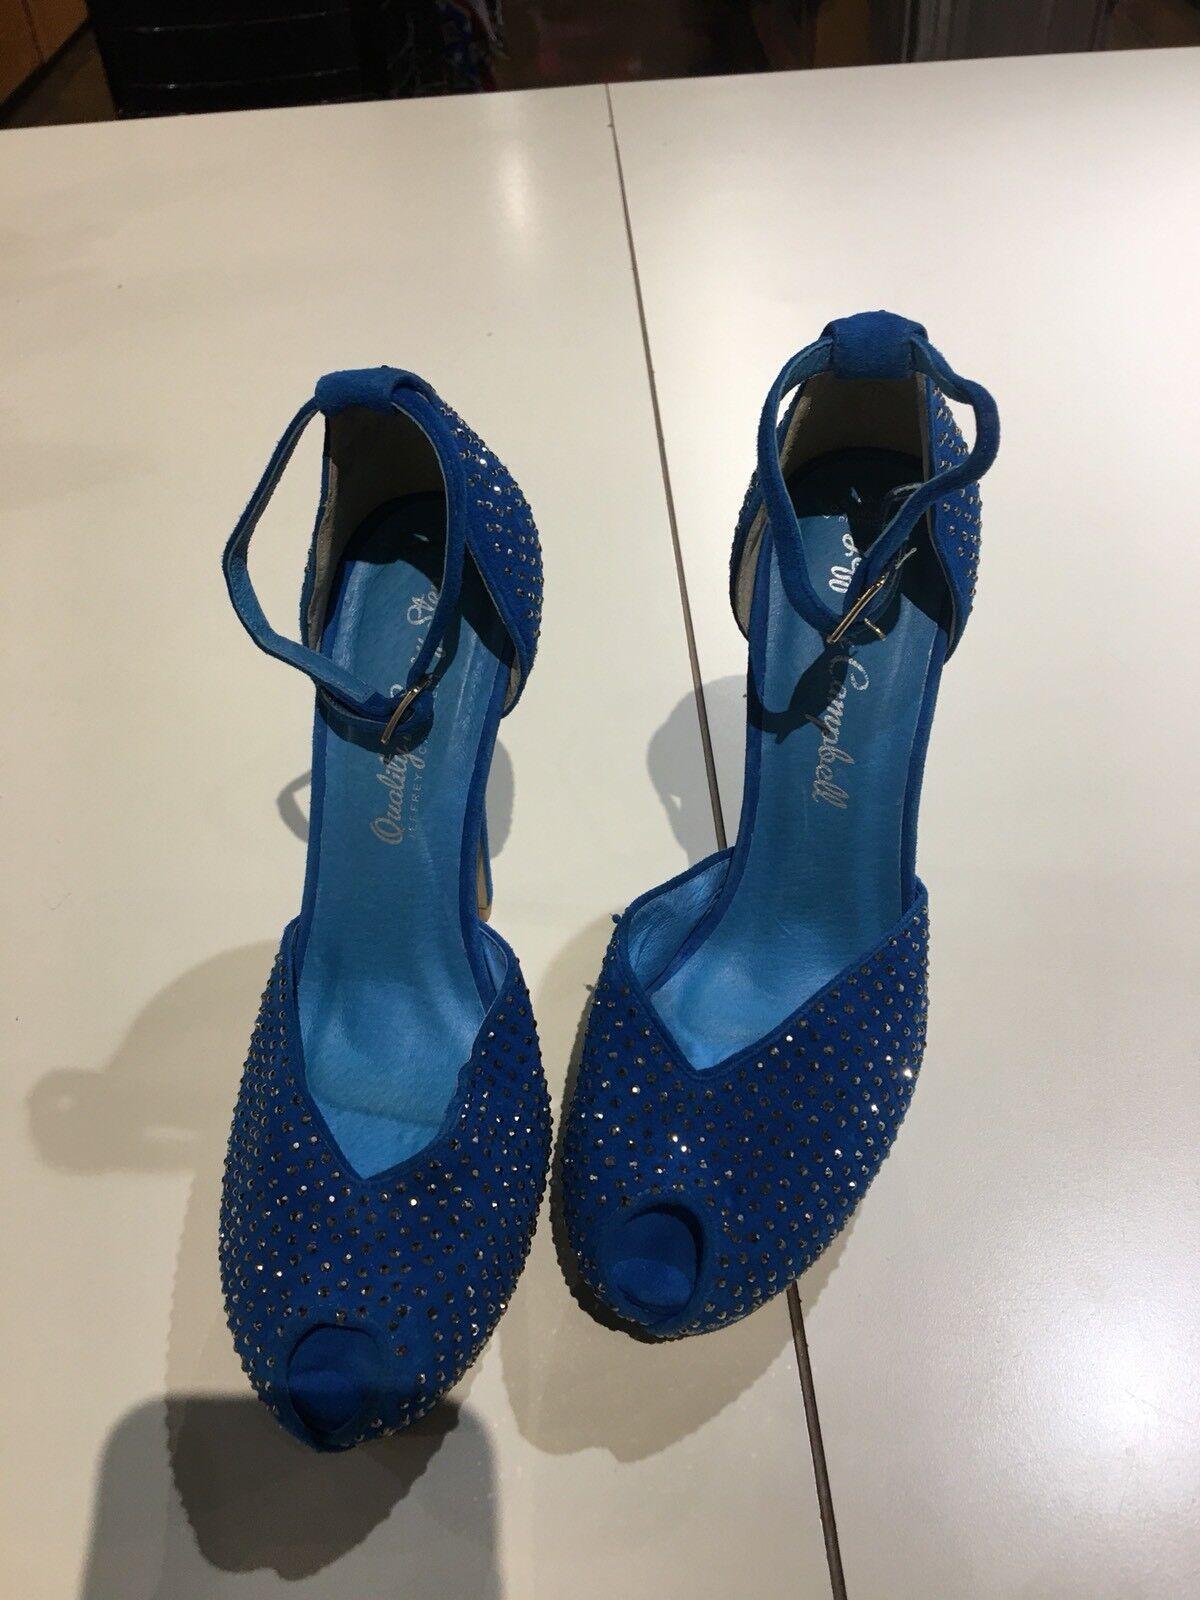 Jeffrey Campbell Midler Studded Heels Open Toe bluee bluee bluee Suede shoes Size 7.5 7b21be